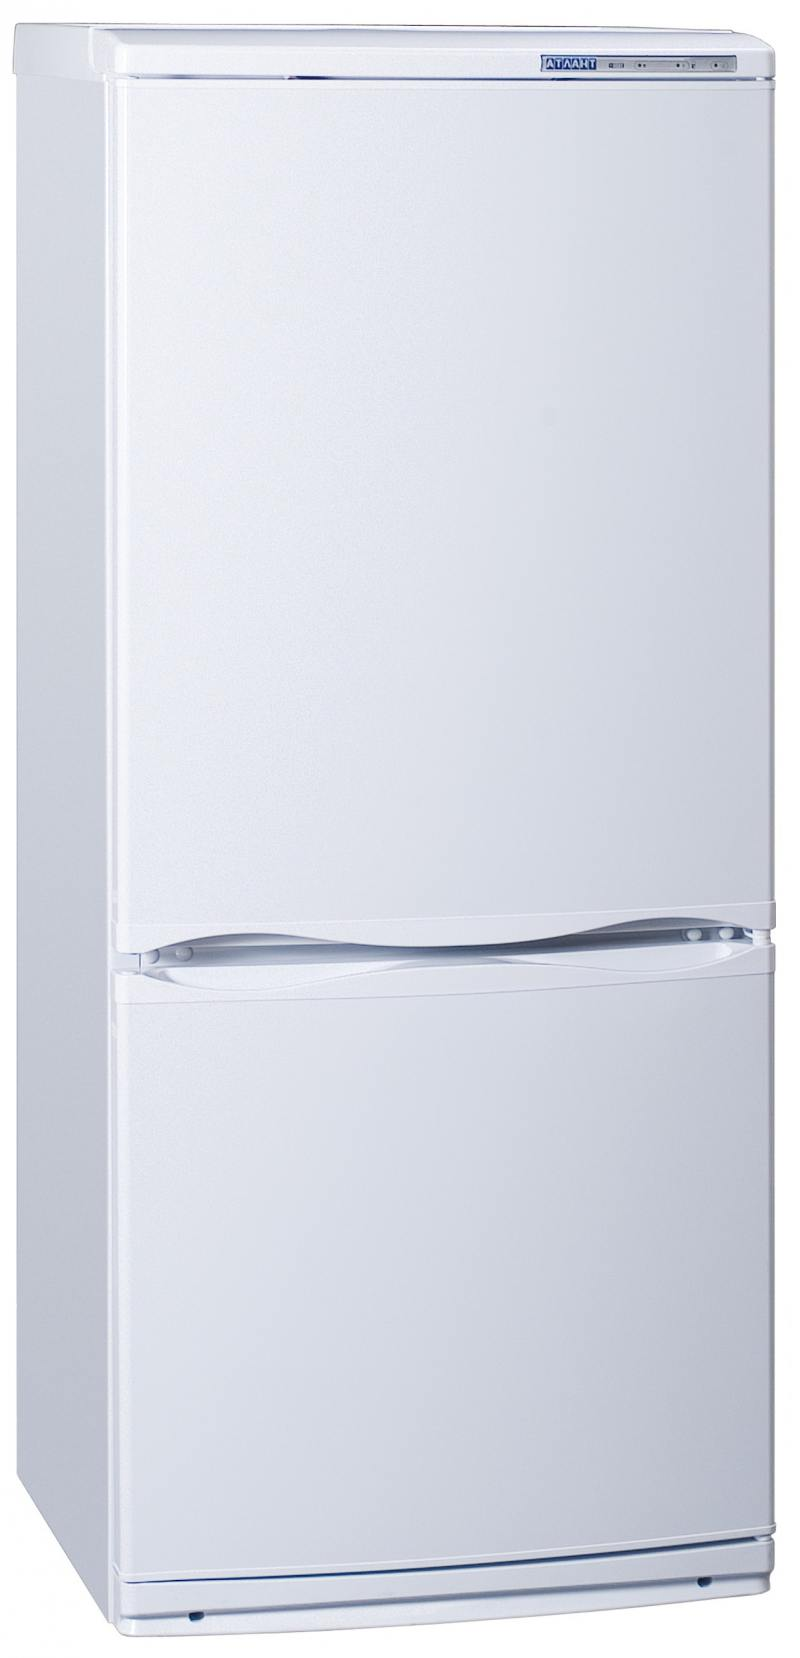 купить Холодильник ATLANT 4008-022 по цене 14190 рублей